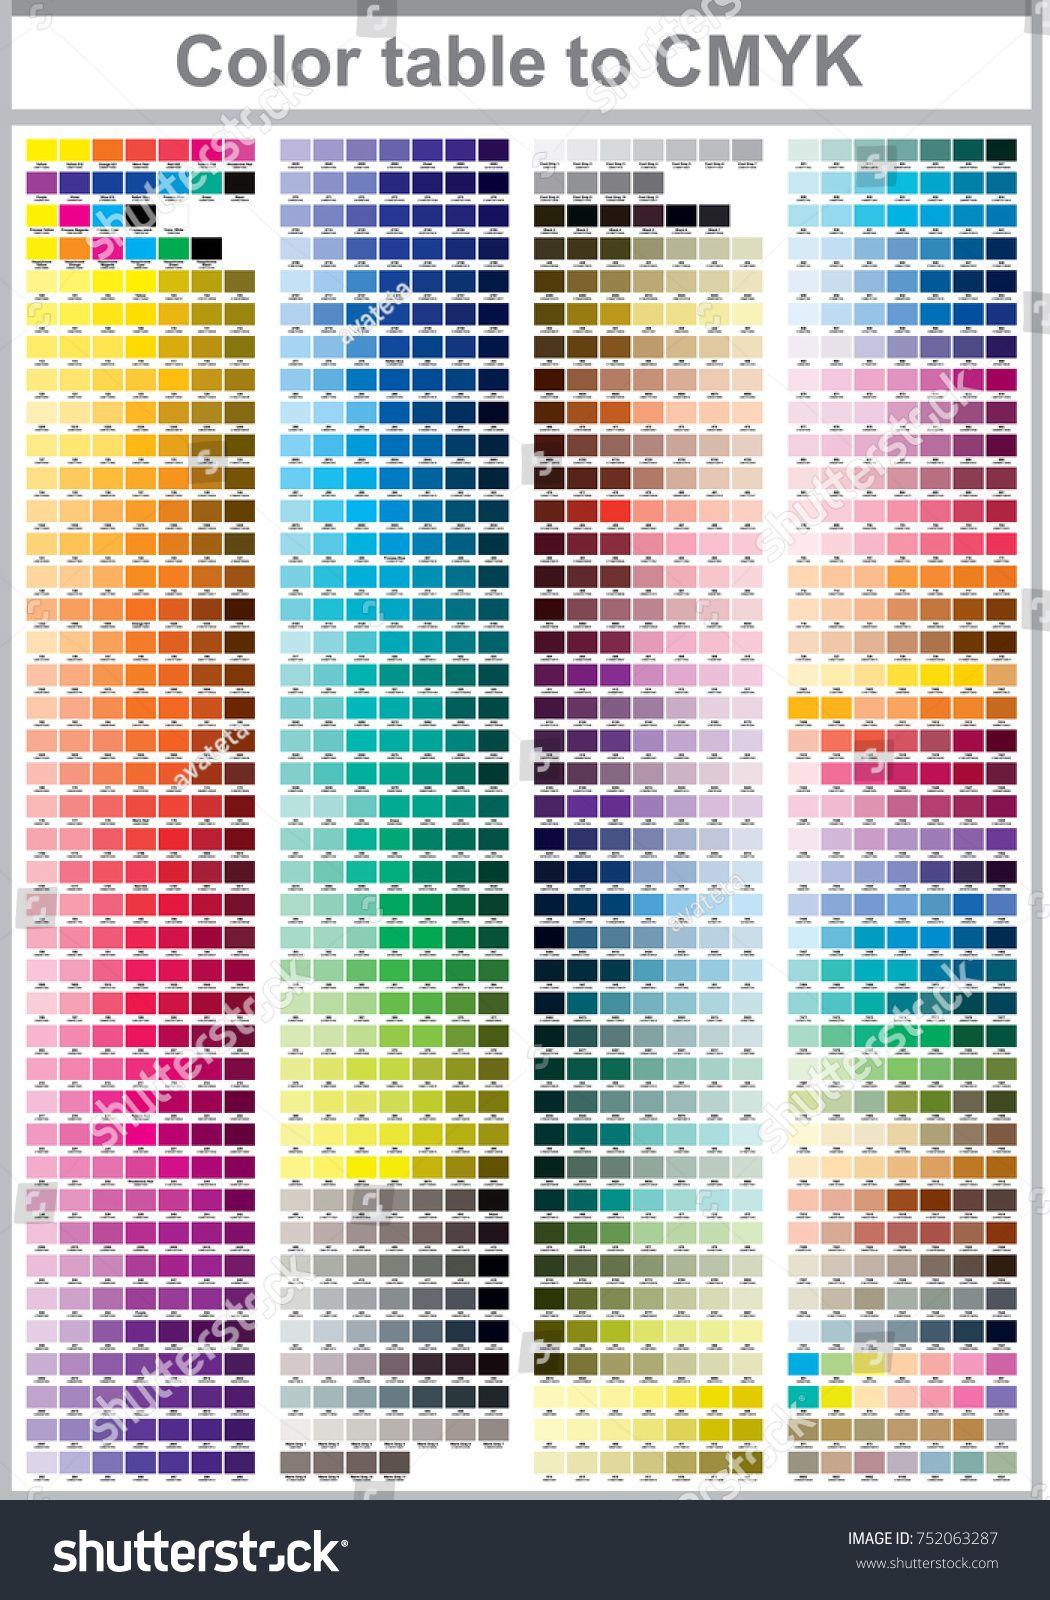 Color print test page illustration cmyk colors for print vector color palette pageillustrationtestcolor